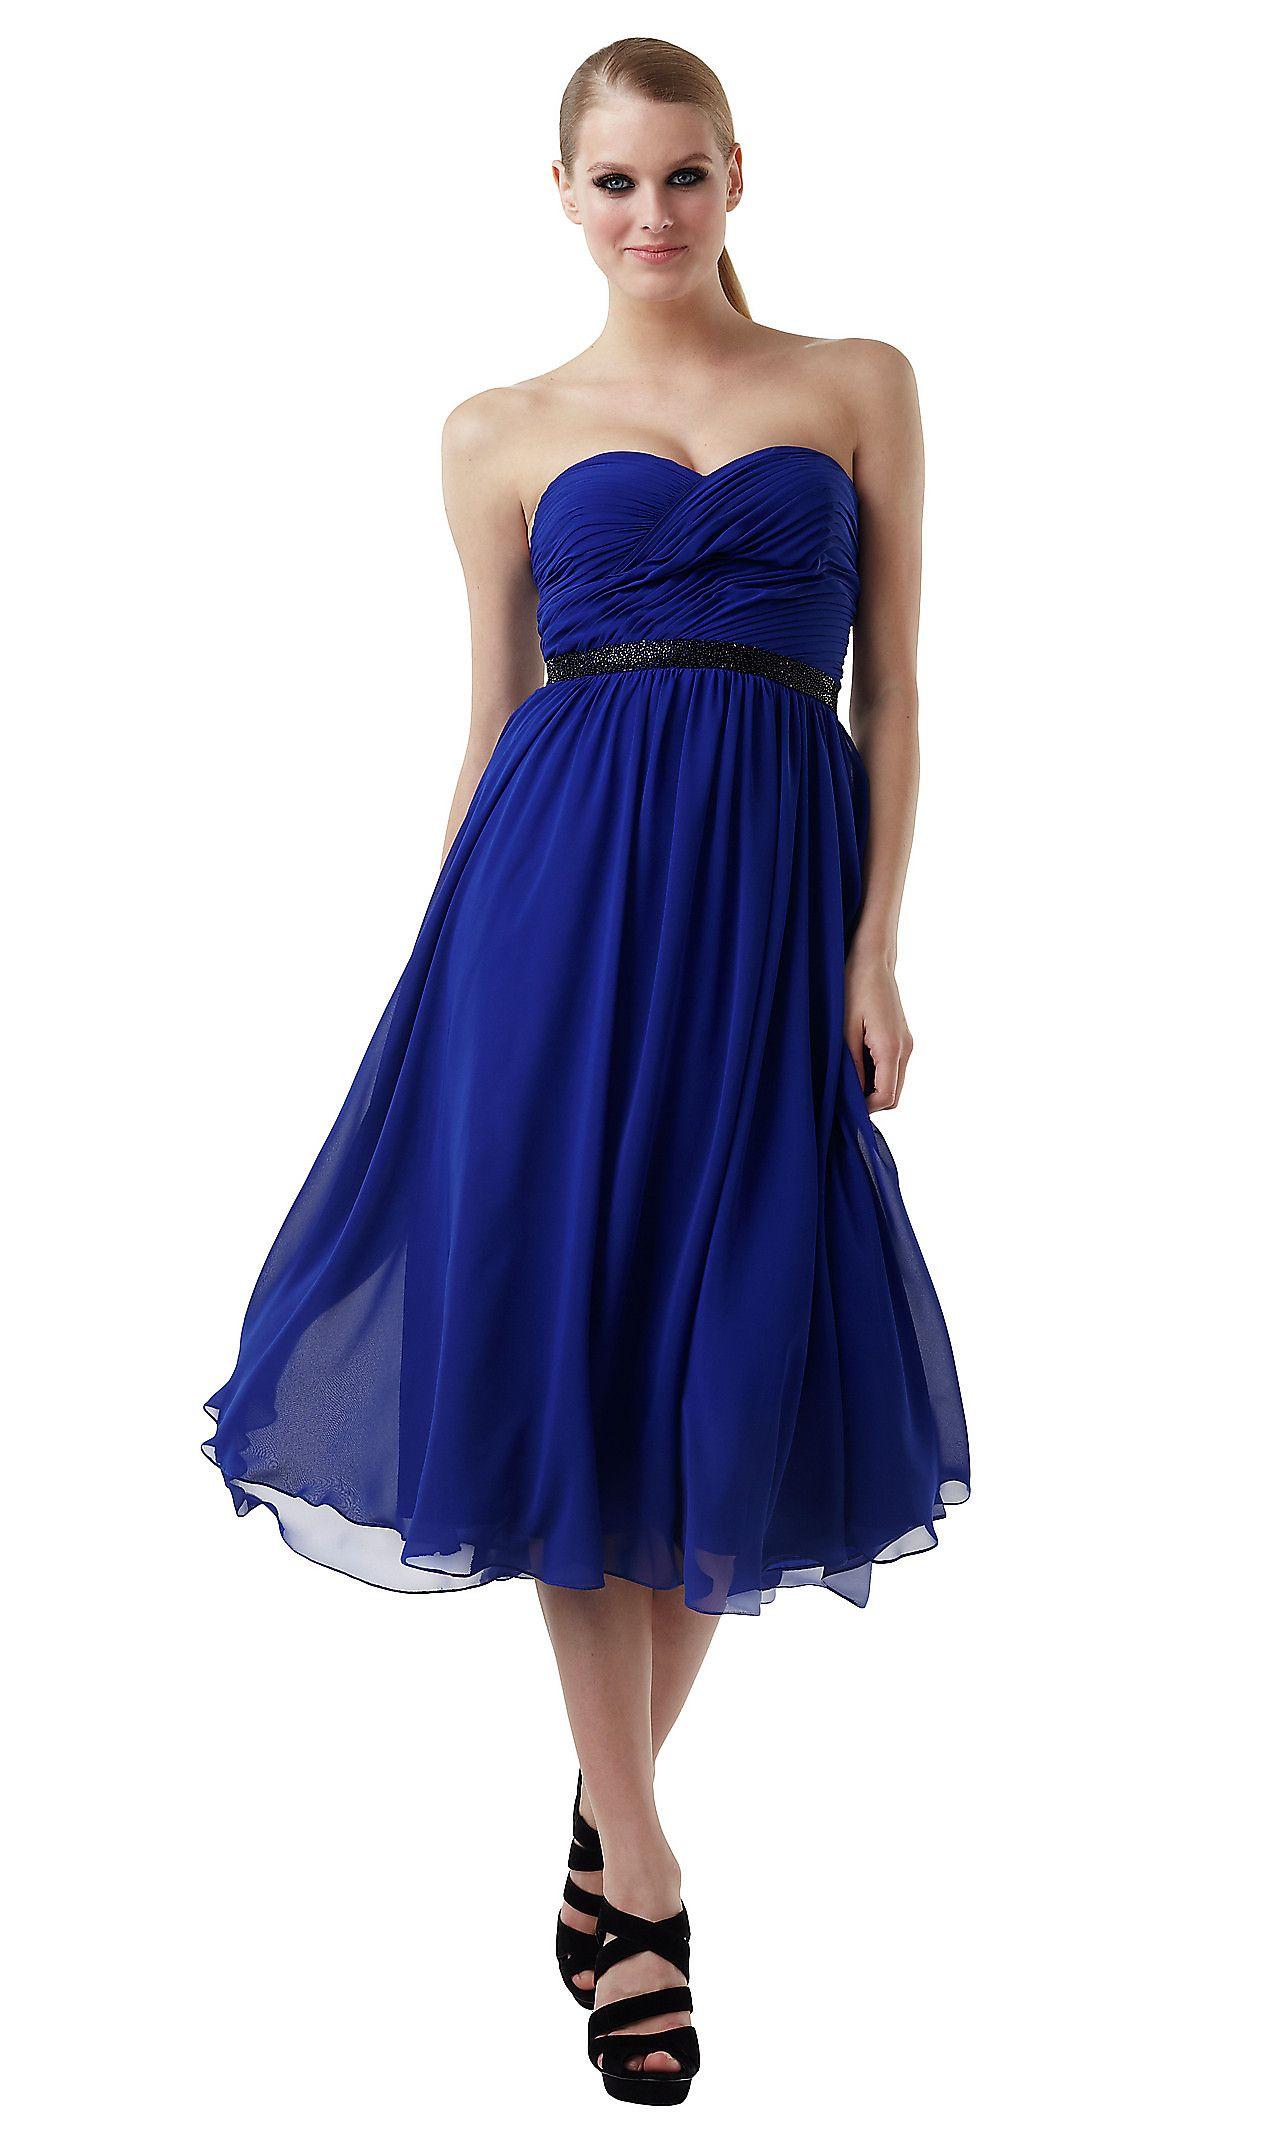 Royal blue bridesmaids dress knee length brides maids dresses